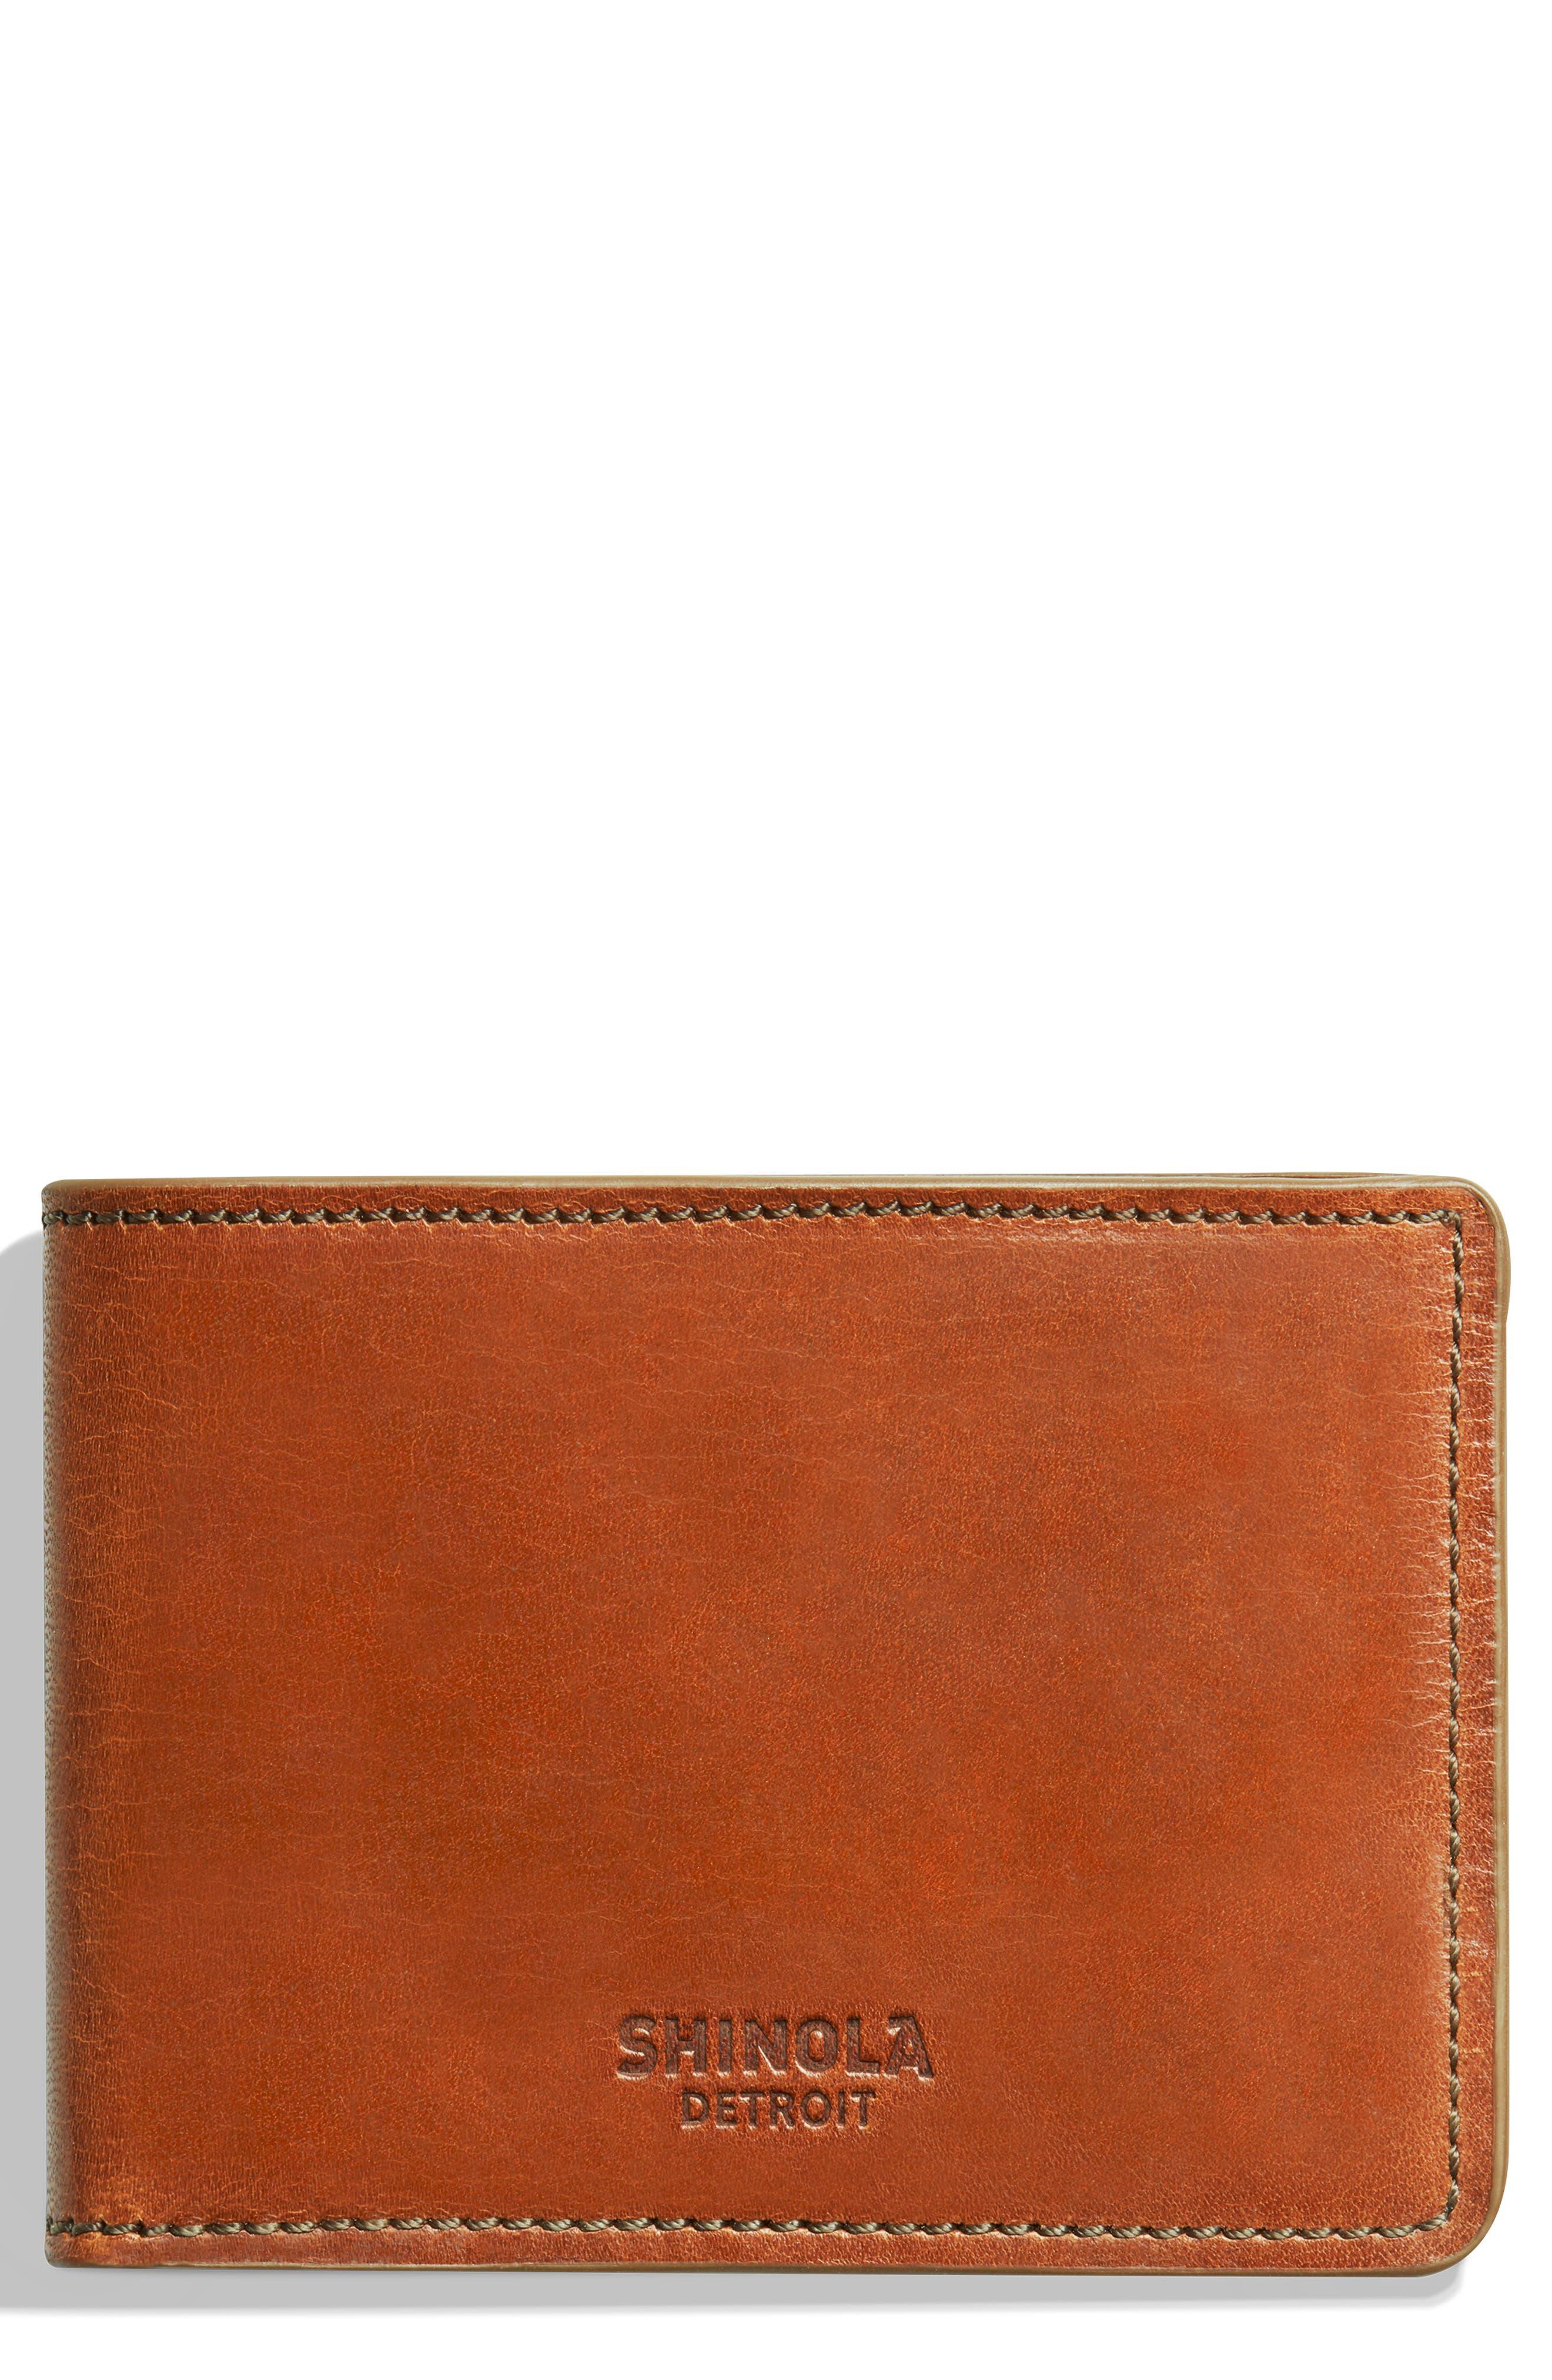 SHINOLA Harness Slim 2.0 Bifold Leather Wallet, Main, color, BOURBON